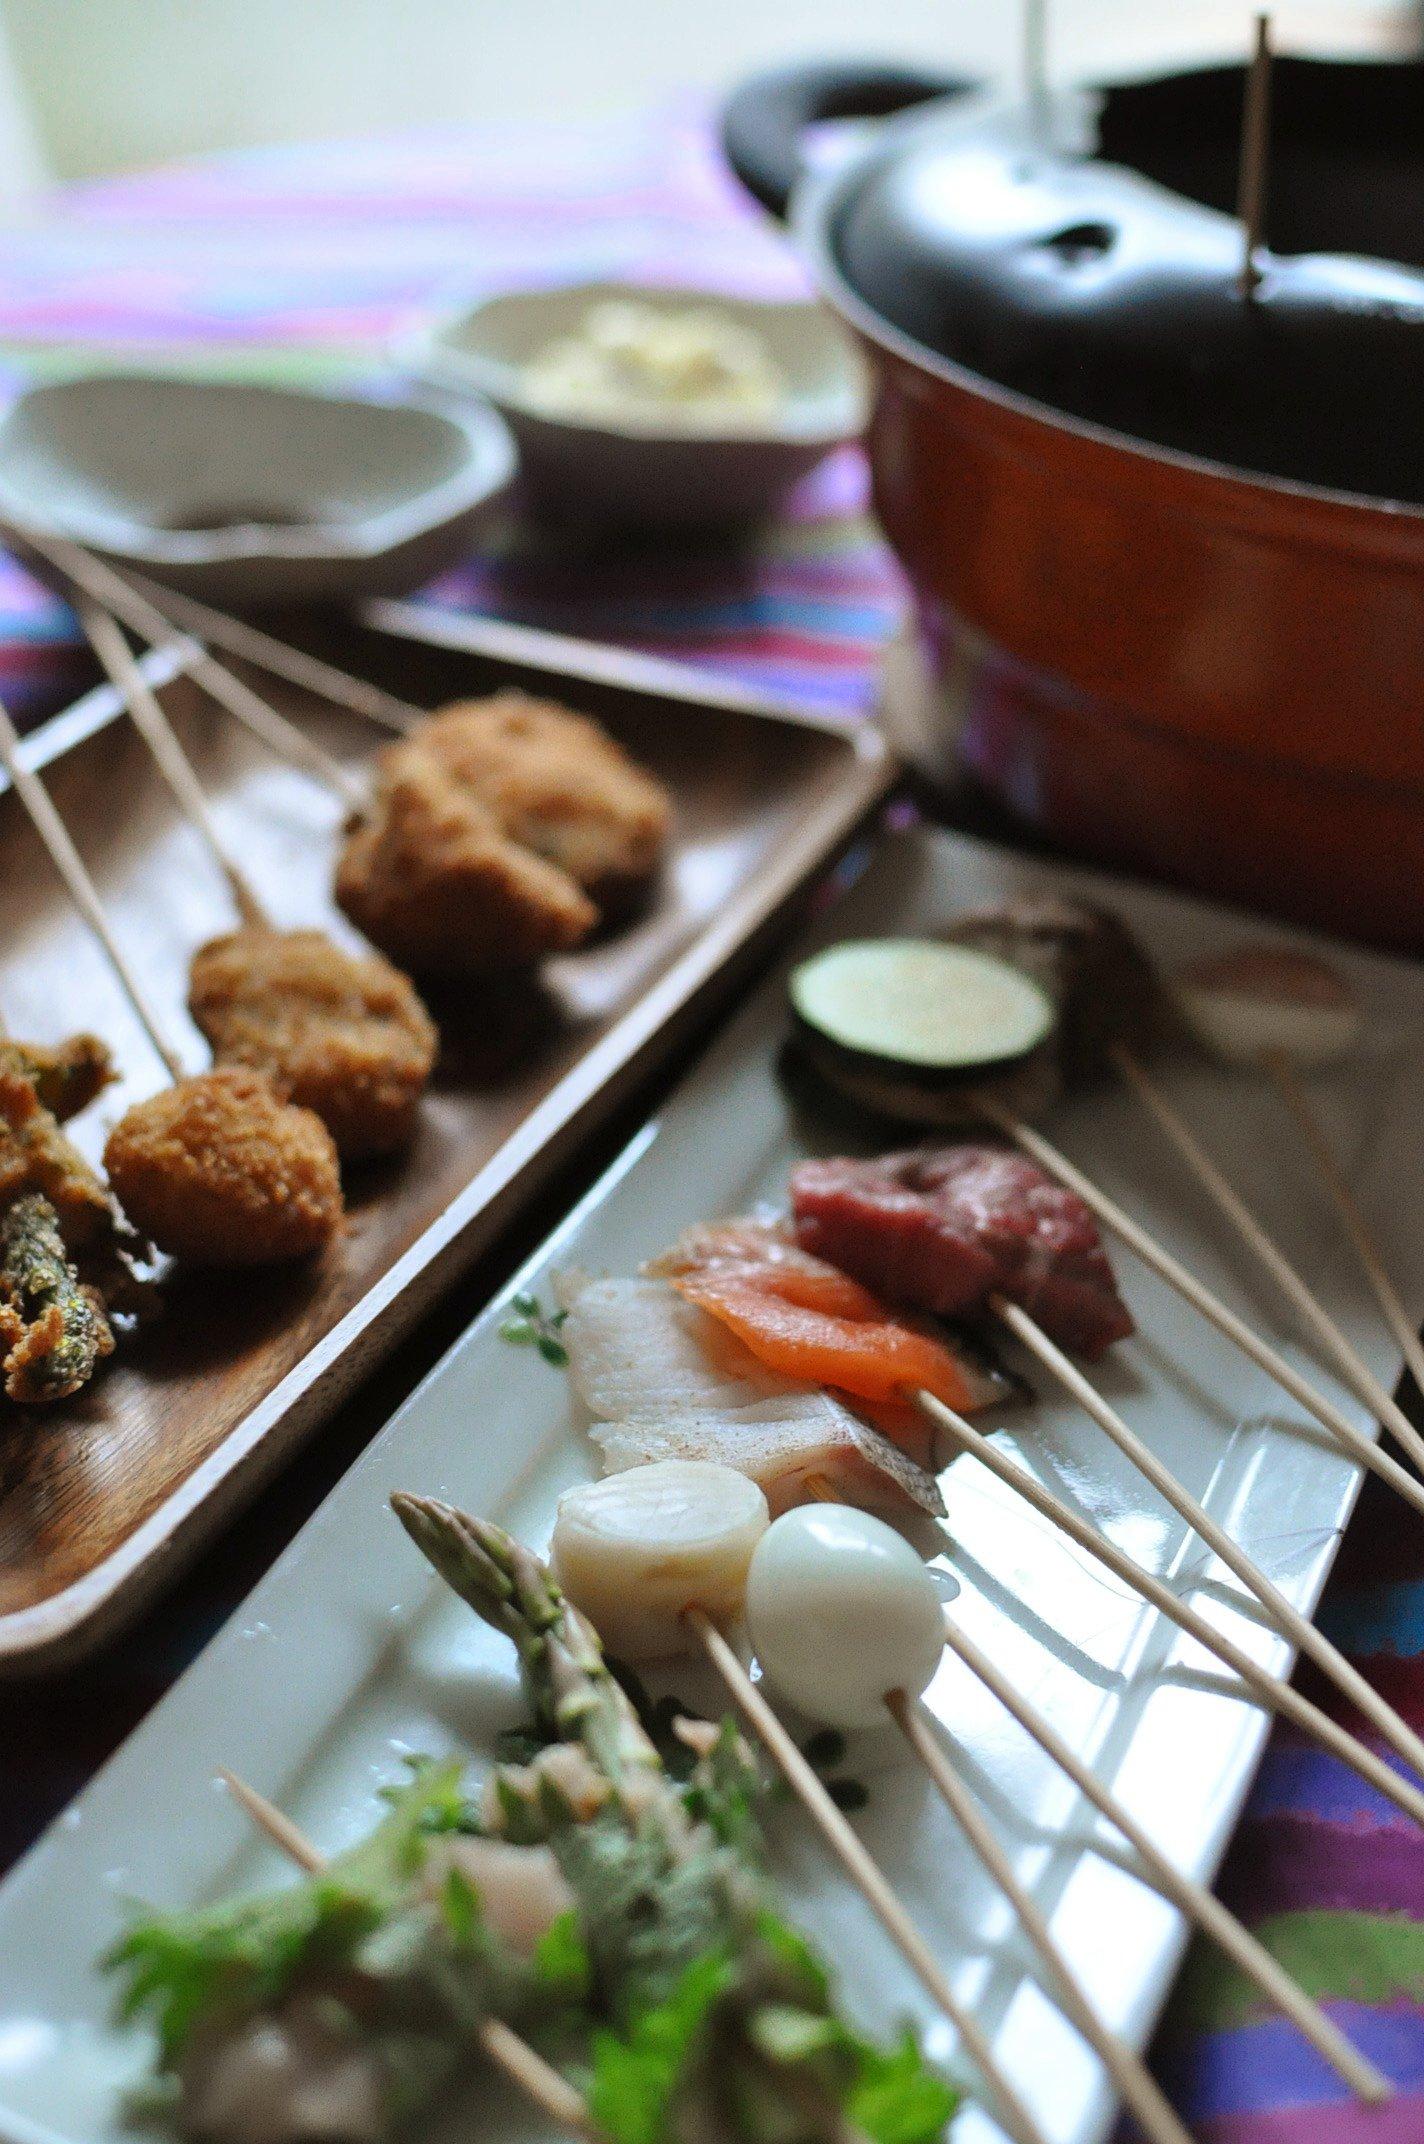 Kushiage (Japanese style oil fondue)